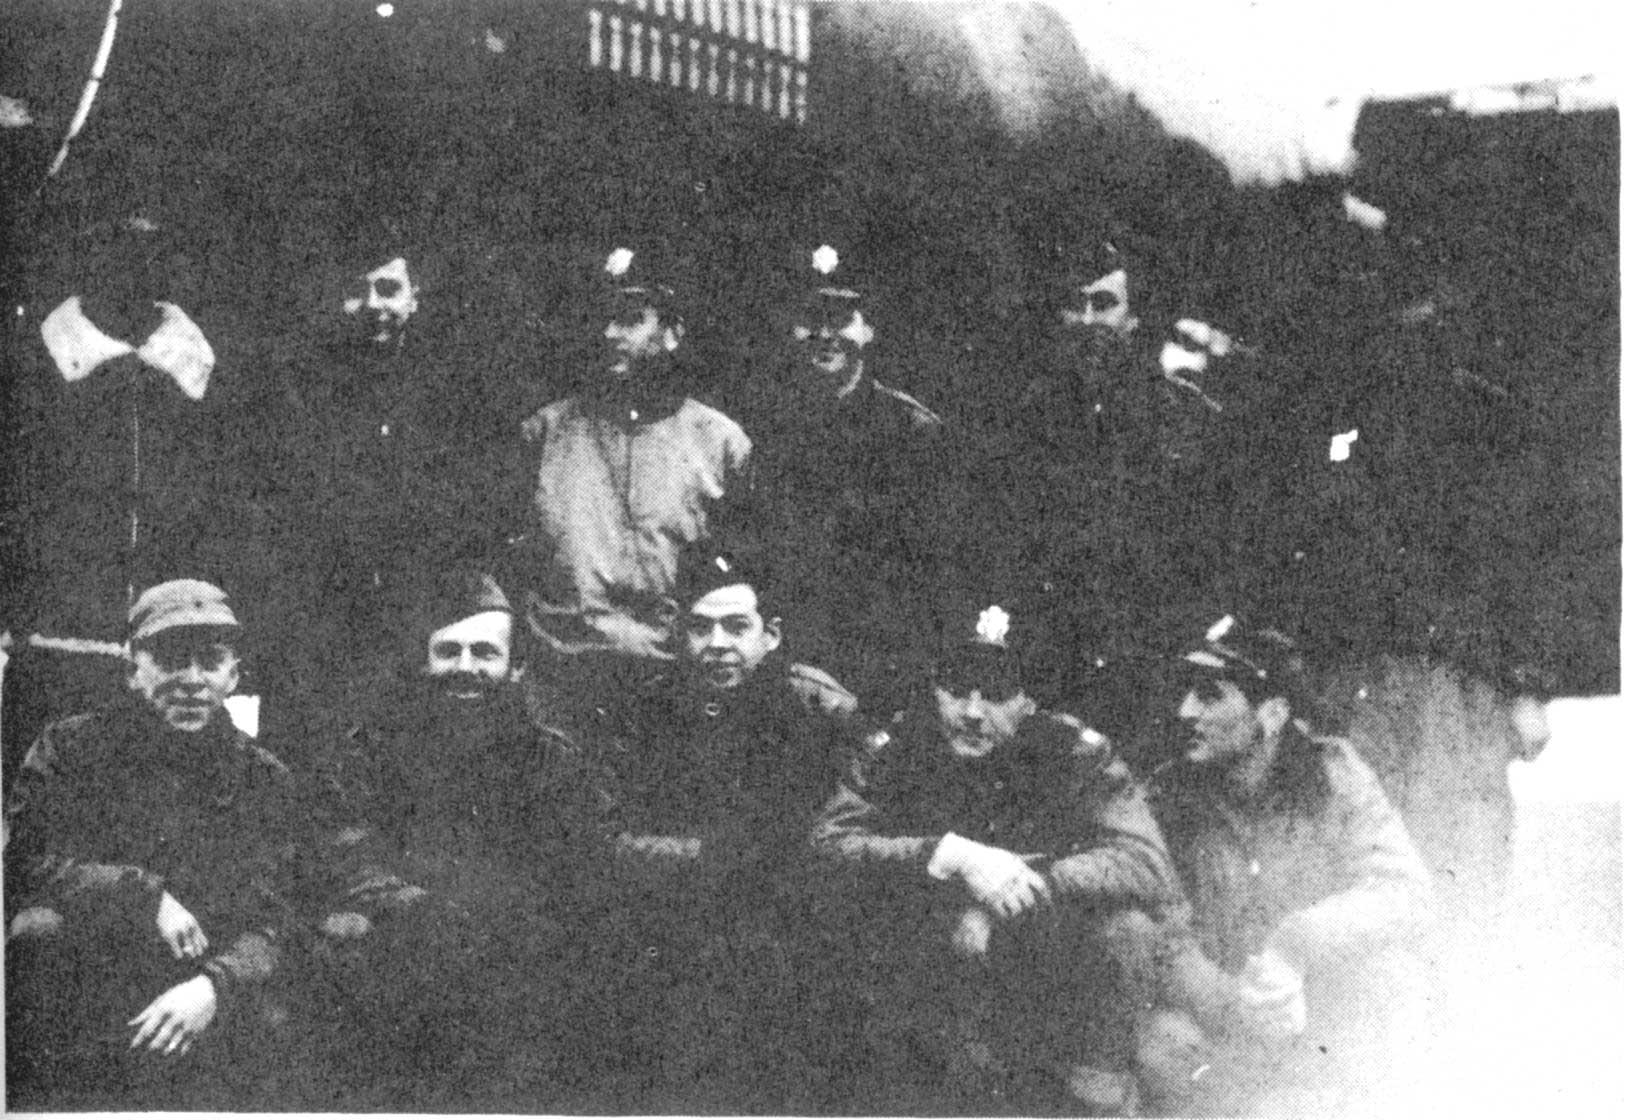 The British Flight Battalion at Pensacola and Afterwards / The British Pensacola Battalion: A Flight Log Representin the British Flight Battalion, U.S. Naval Air Station, Pensacola, Florida, 1941-1944 Frank Robinson